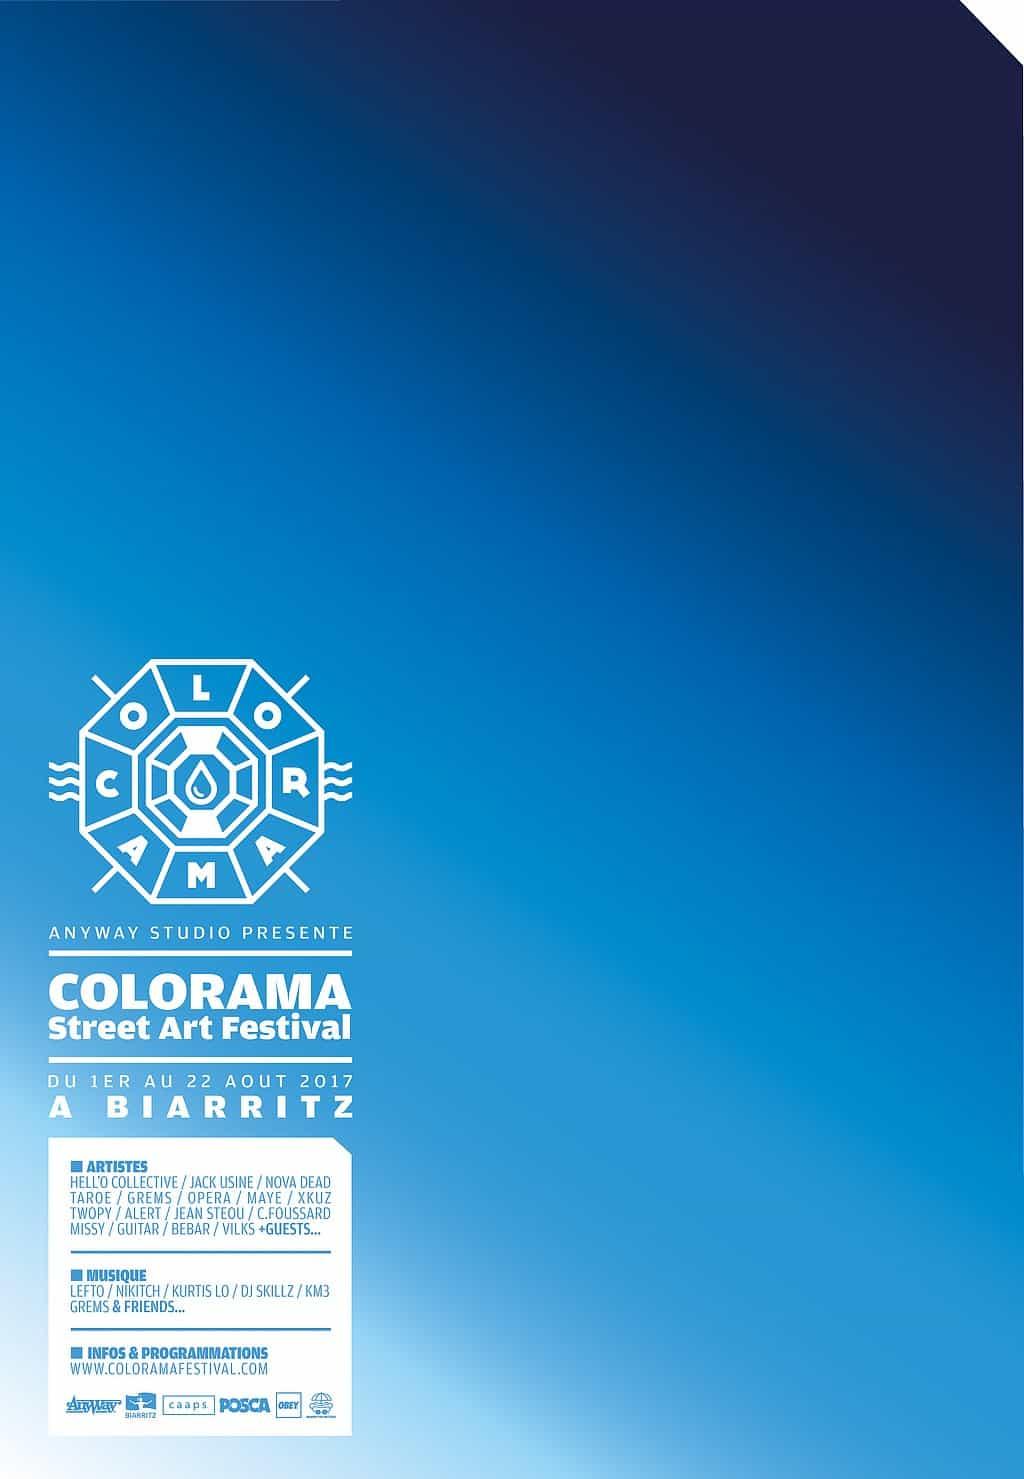 affiche A4-coloramastreetartfestival-2017